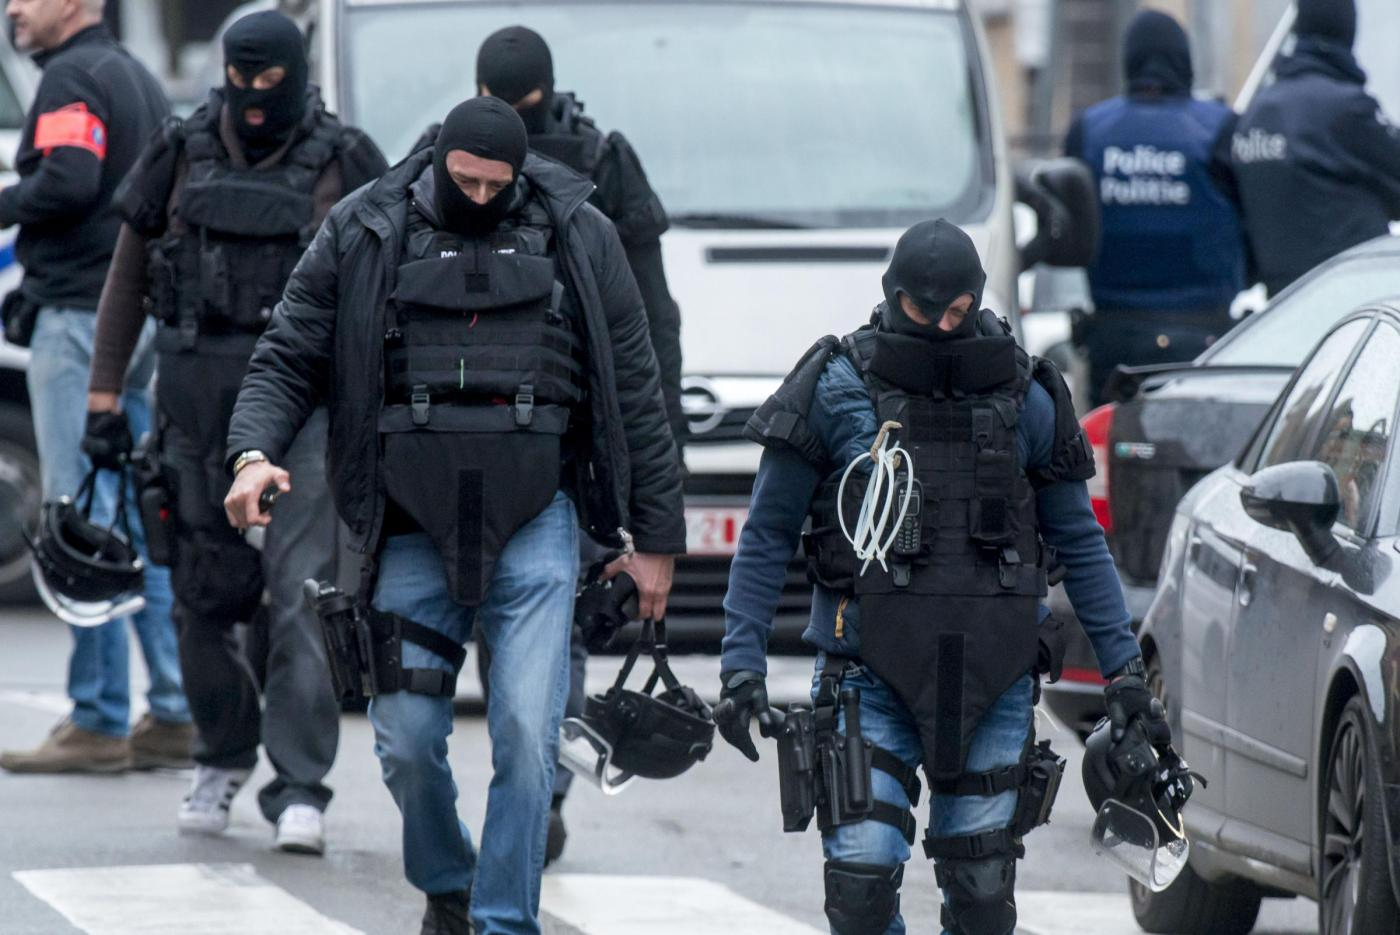 Assedio a Bruxelles: si cerca Abdeslam Salah, attentatore al Bataclan